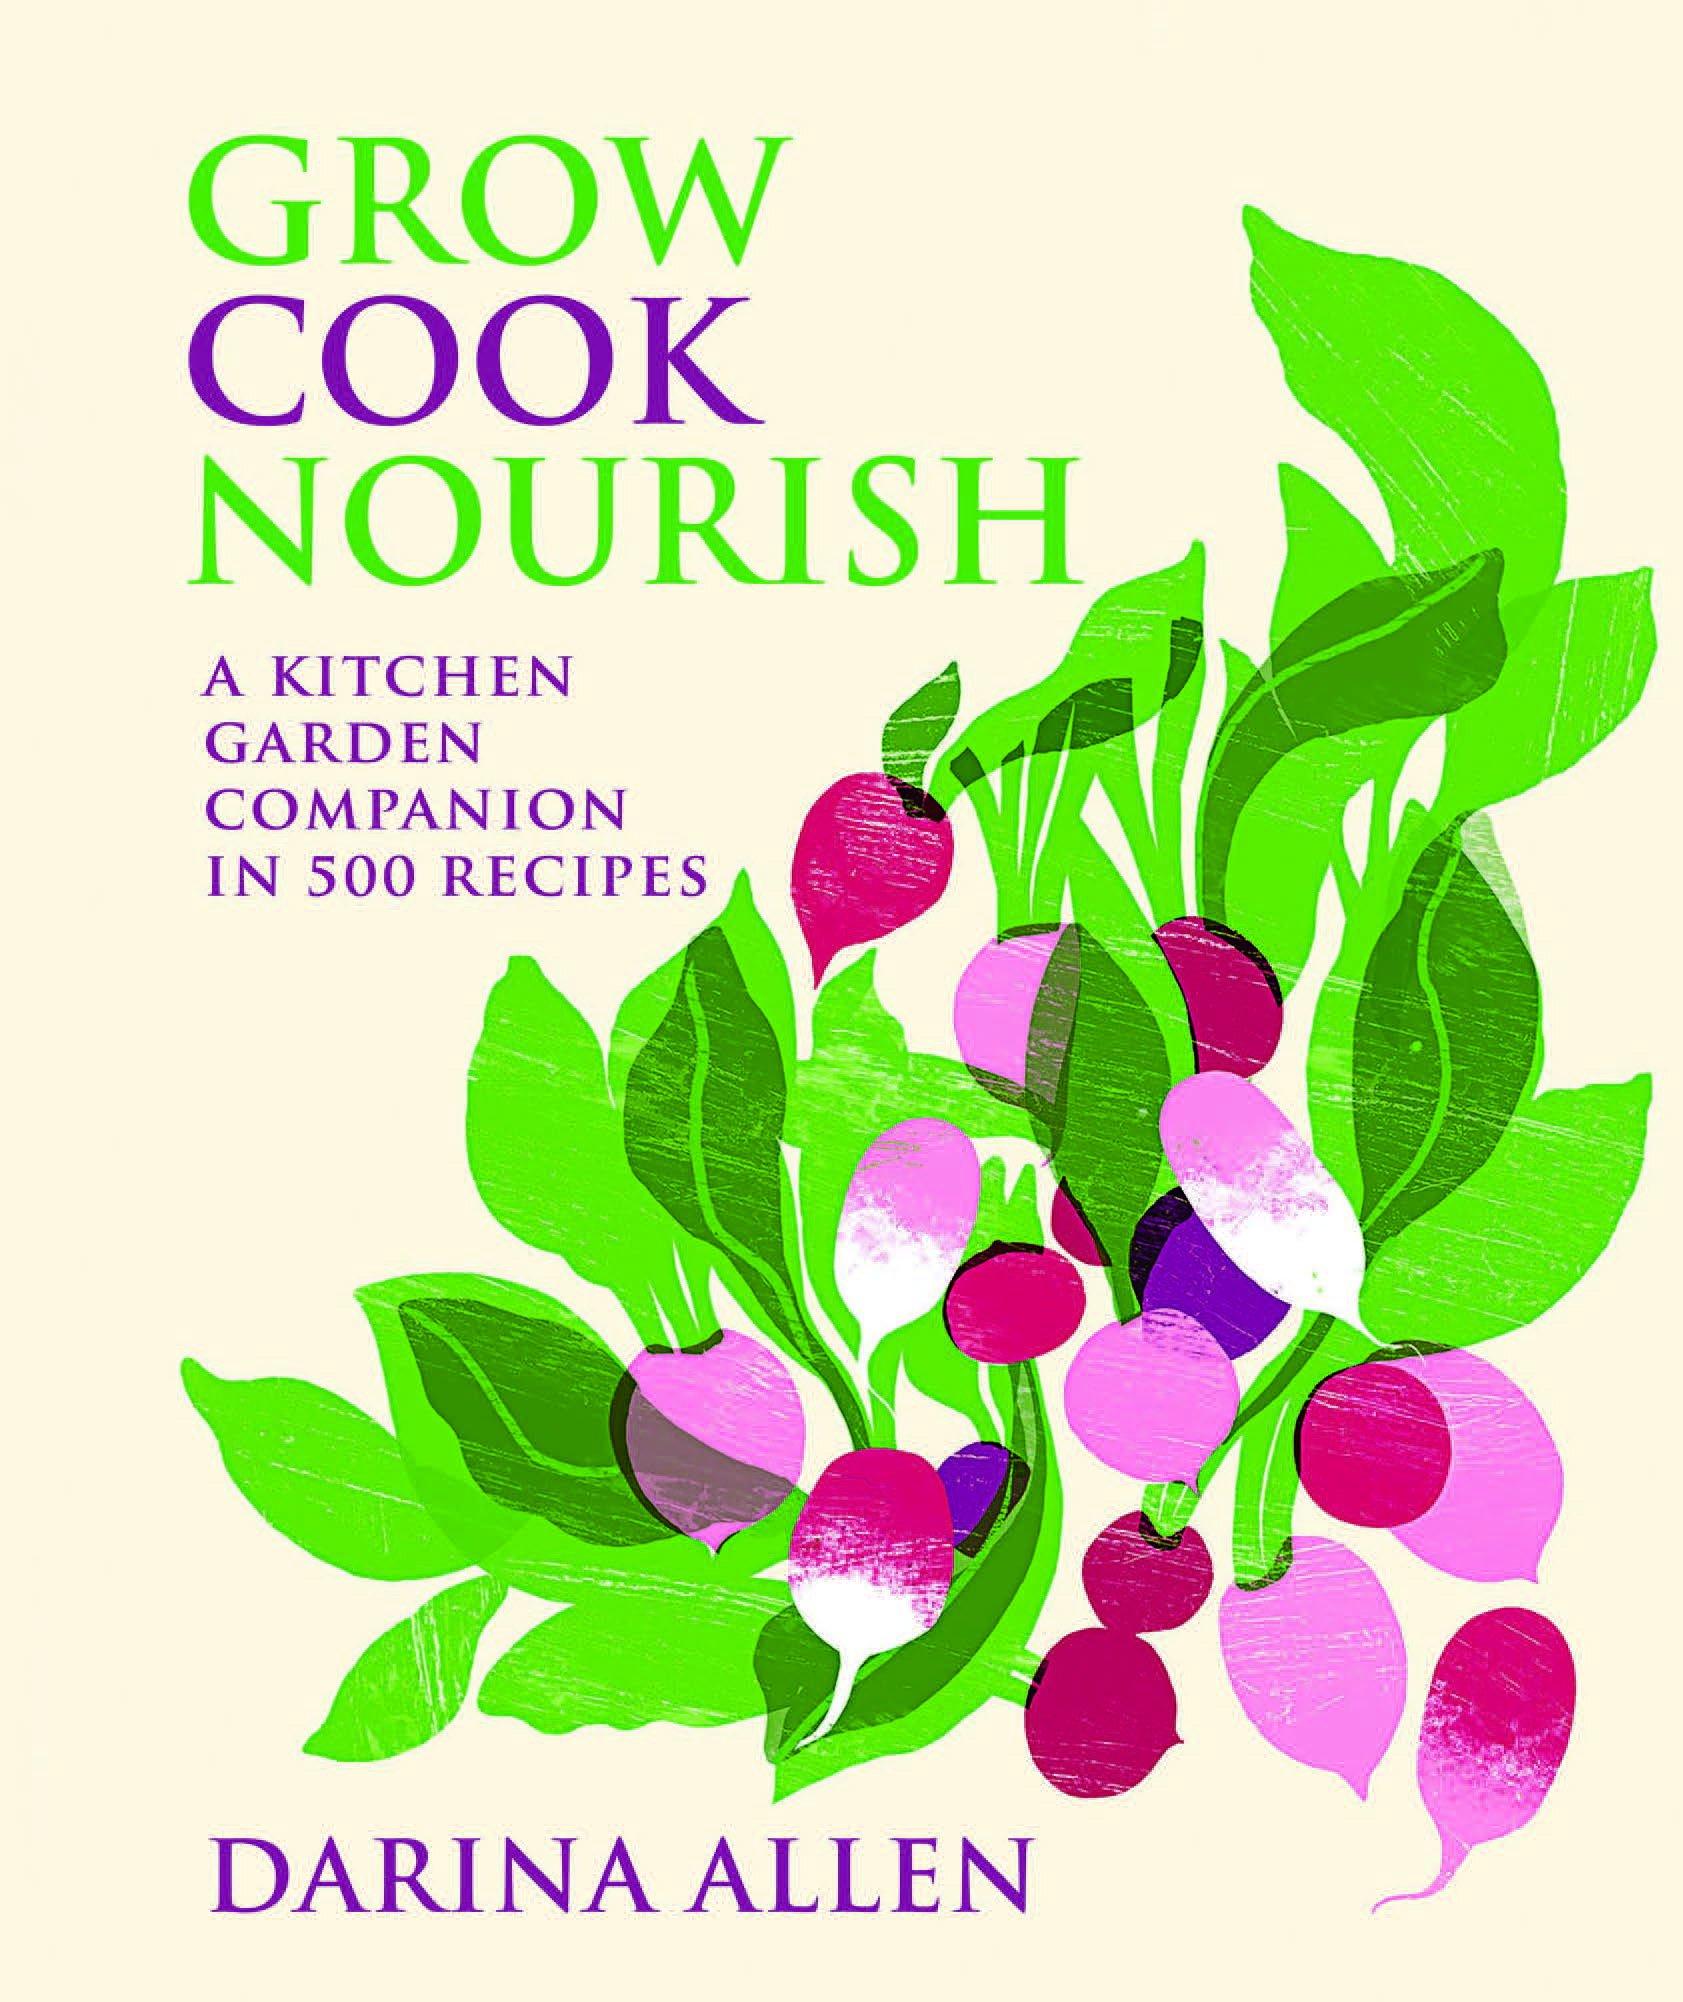 Grow Cook Nourish: A Kitchen Garden Companion in 500 Recipes: Darina Allen:  9781909487741: Amazon.com: Books